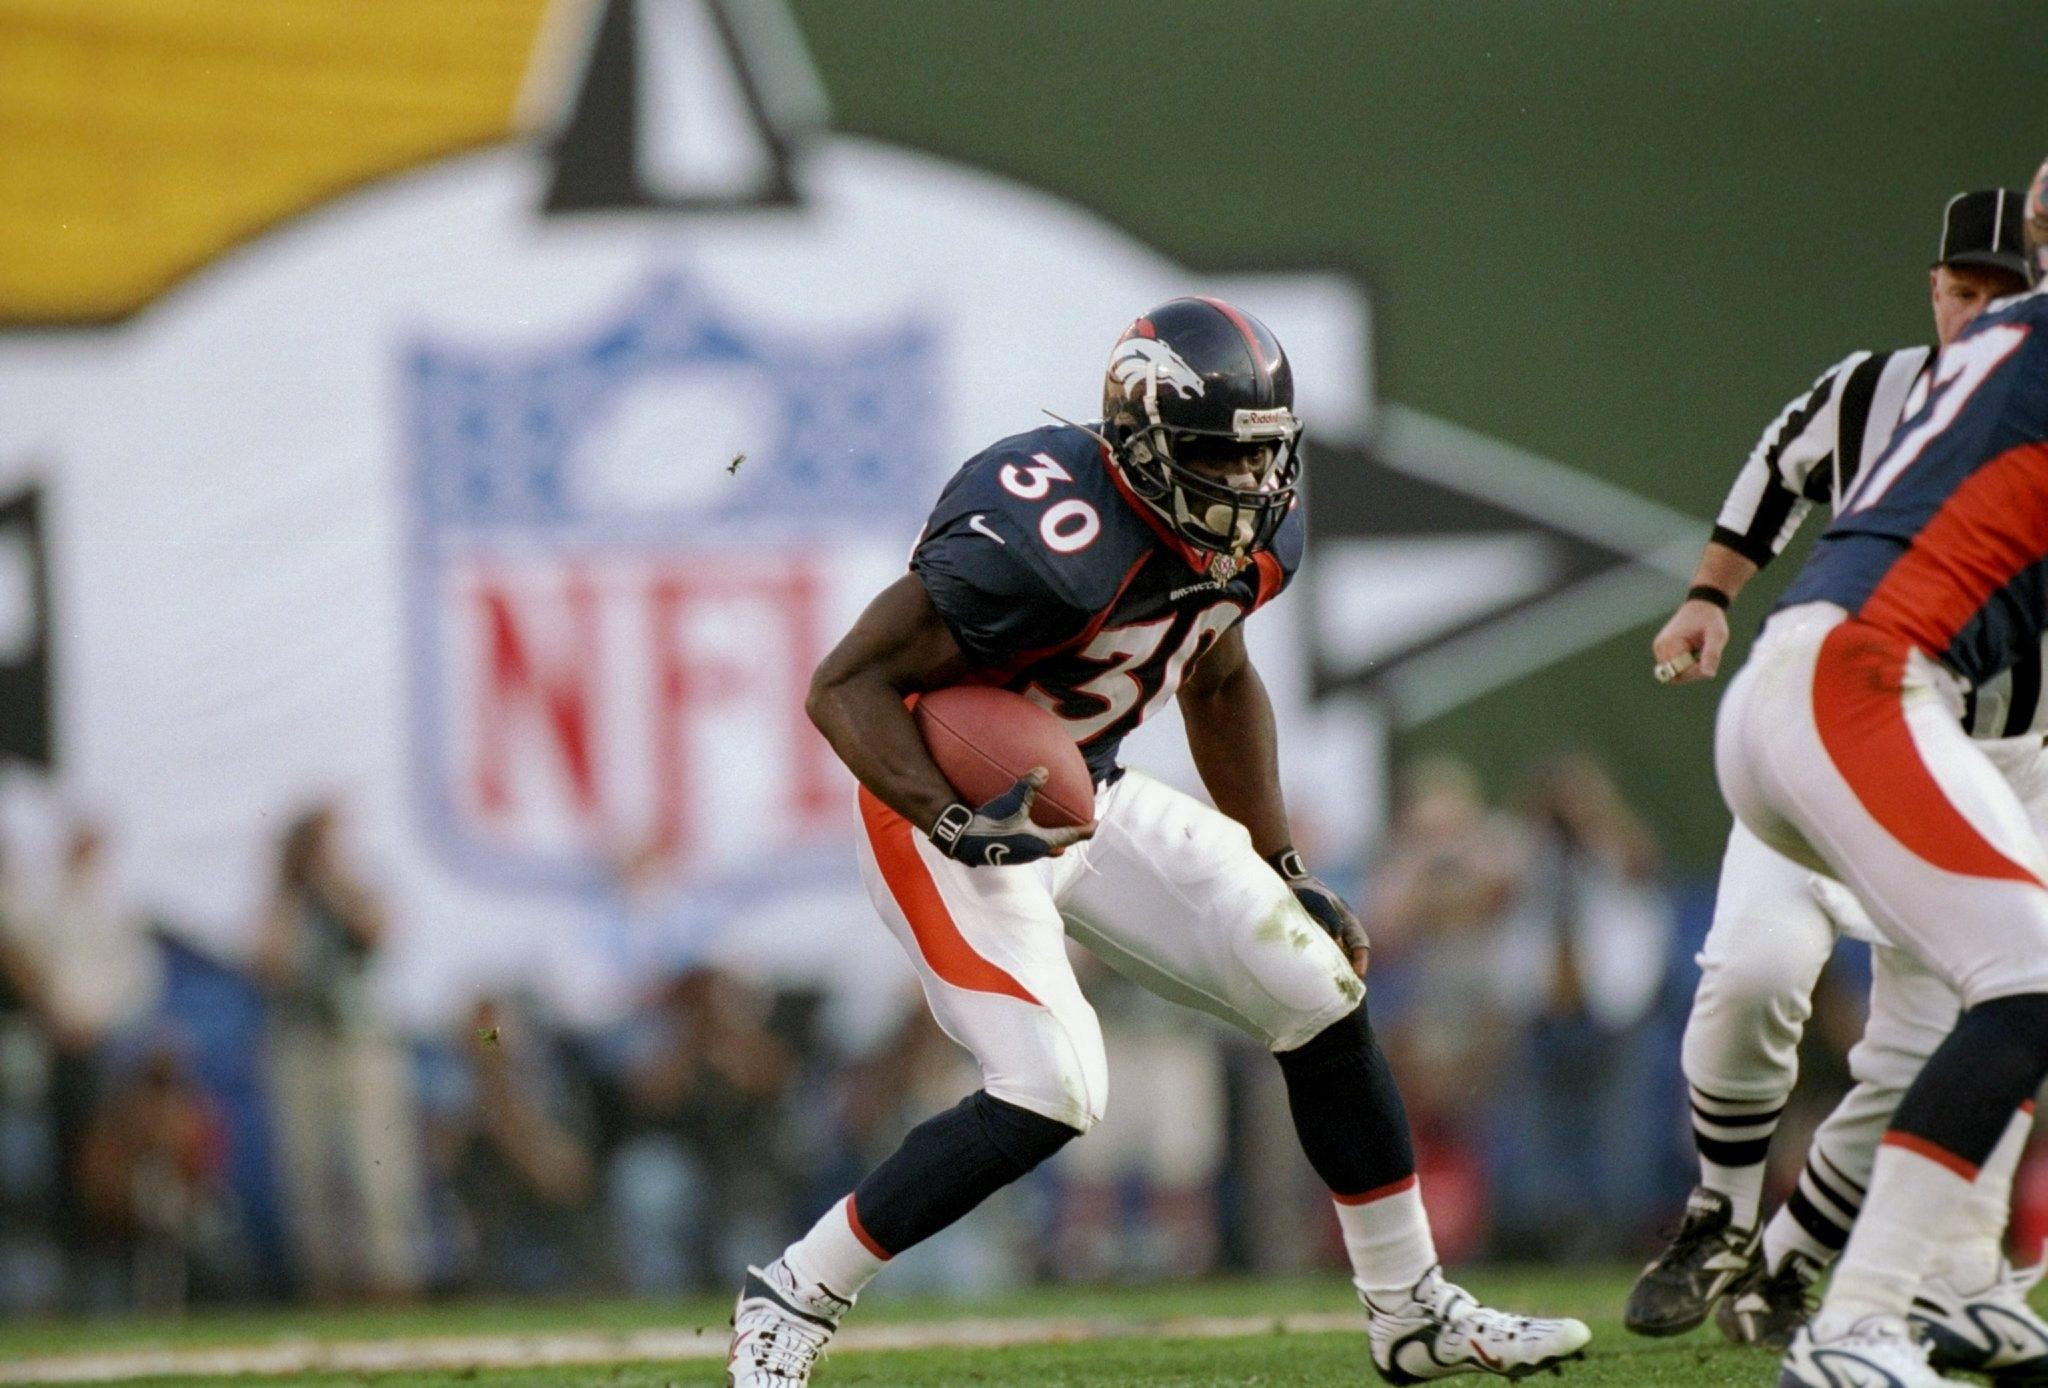 Terrell Davis was the last running back to win the Super Bowl MVP Award.